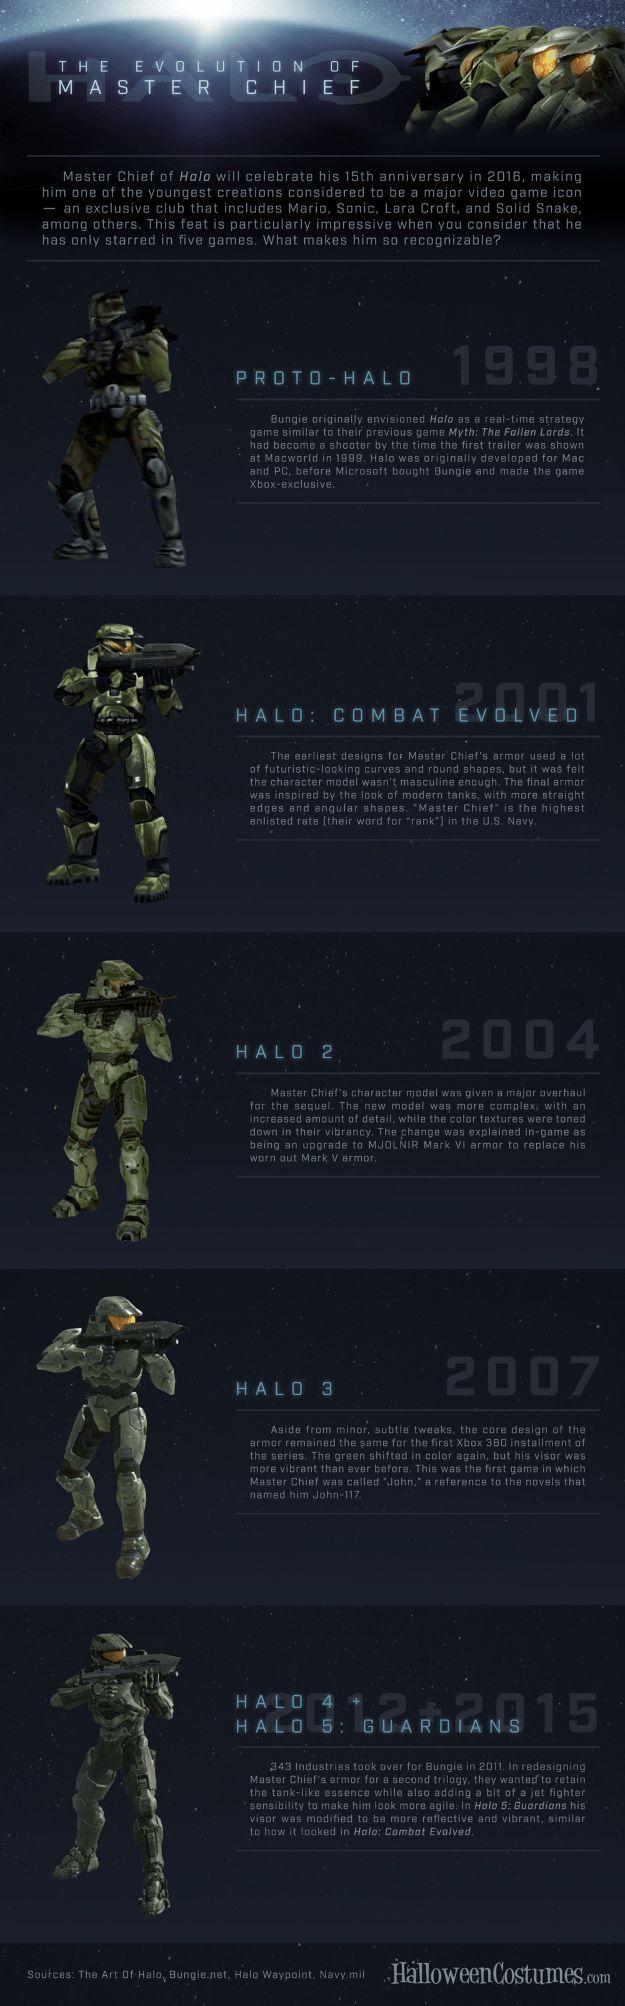 Halo Master Chief Evolution Infographic